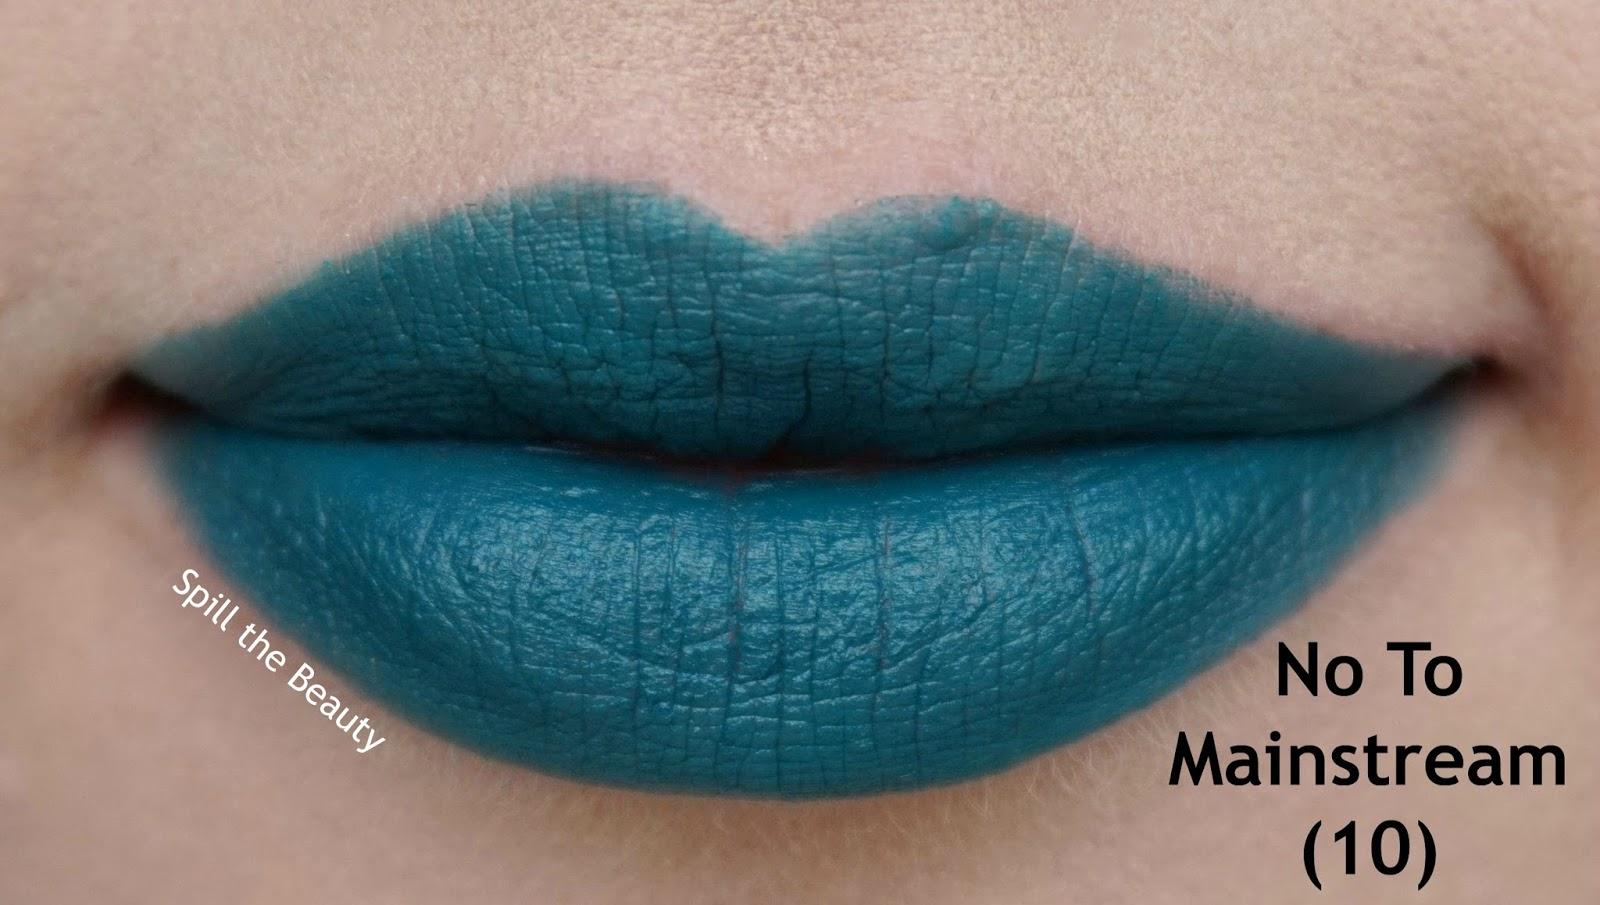 essence matt matt matt vibrant shock lipstick review swatches 10 no to mainstream - lips